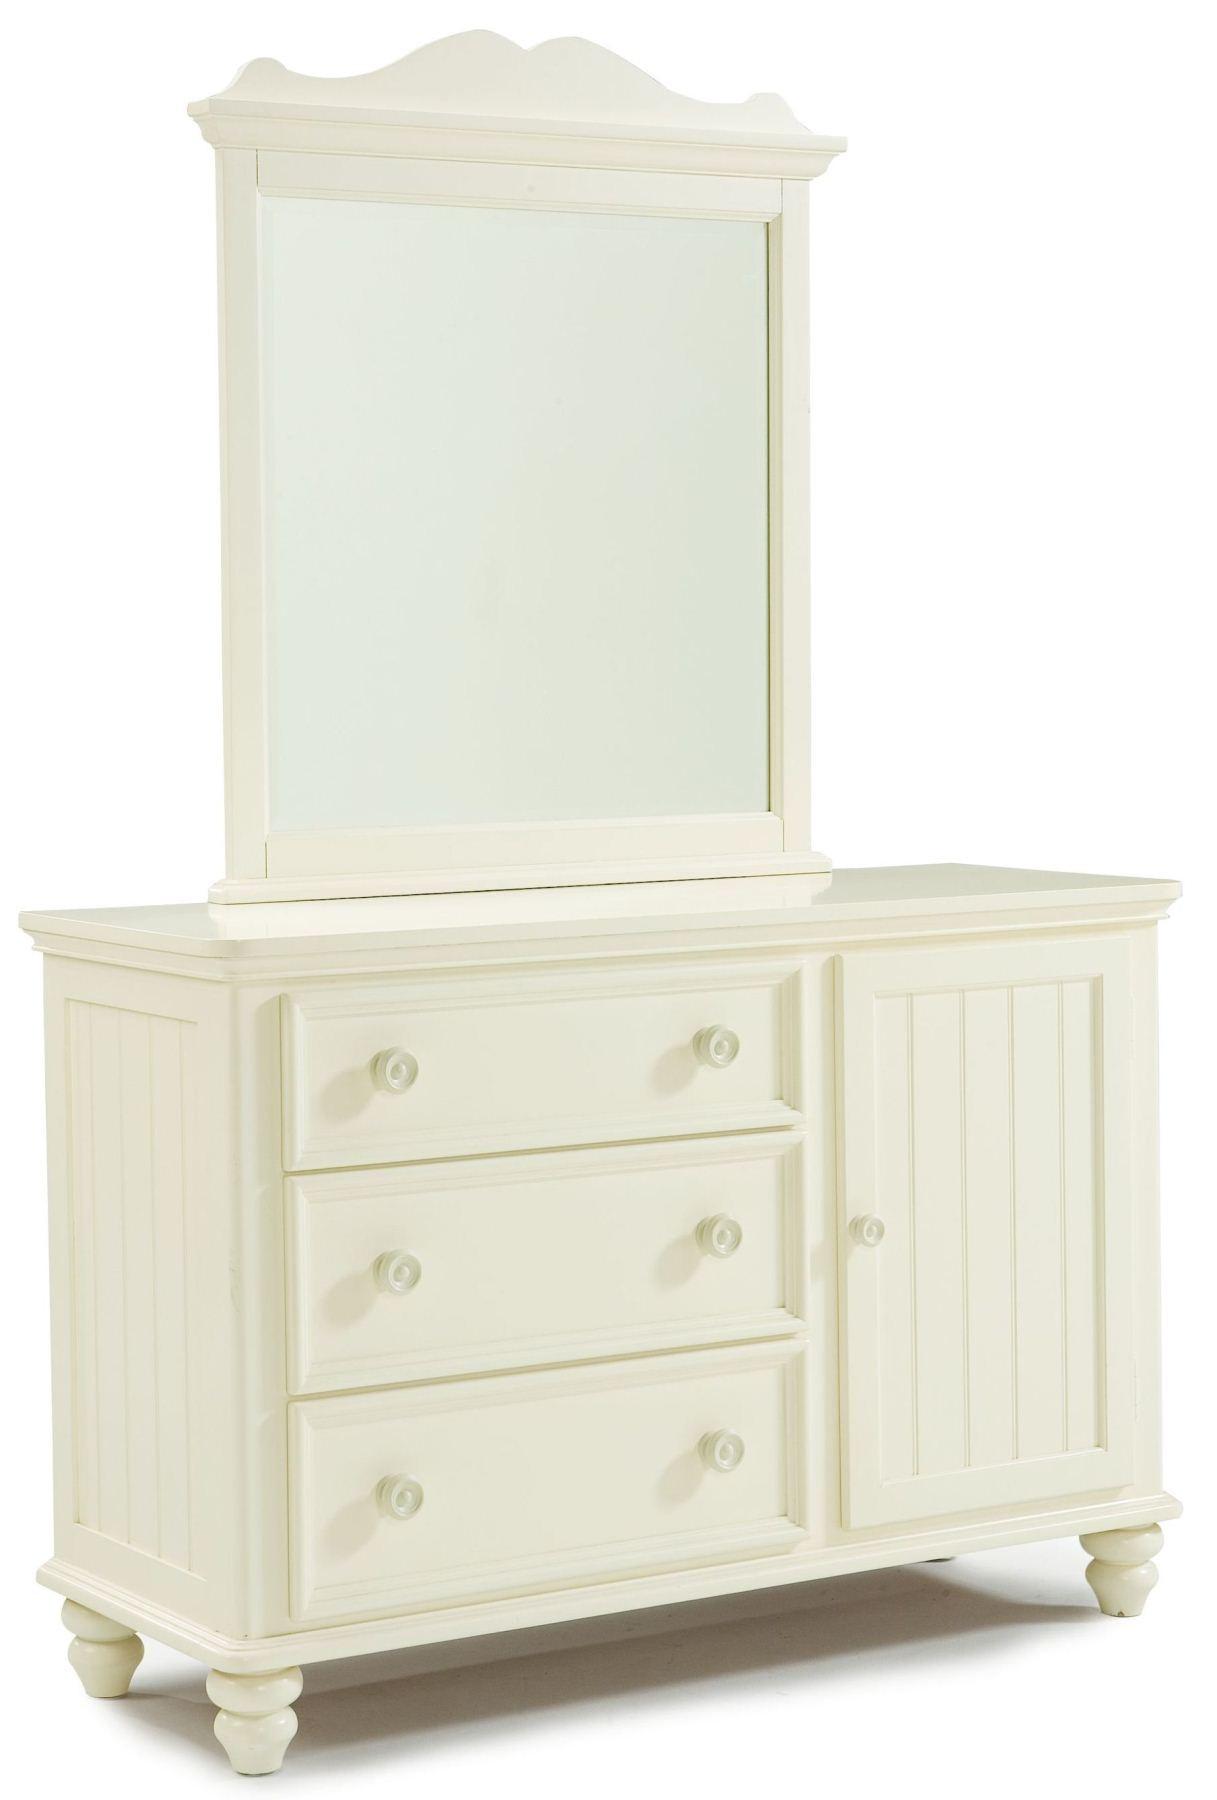 summer breeze bunk bedroom set legacy furniture 481 8110